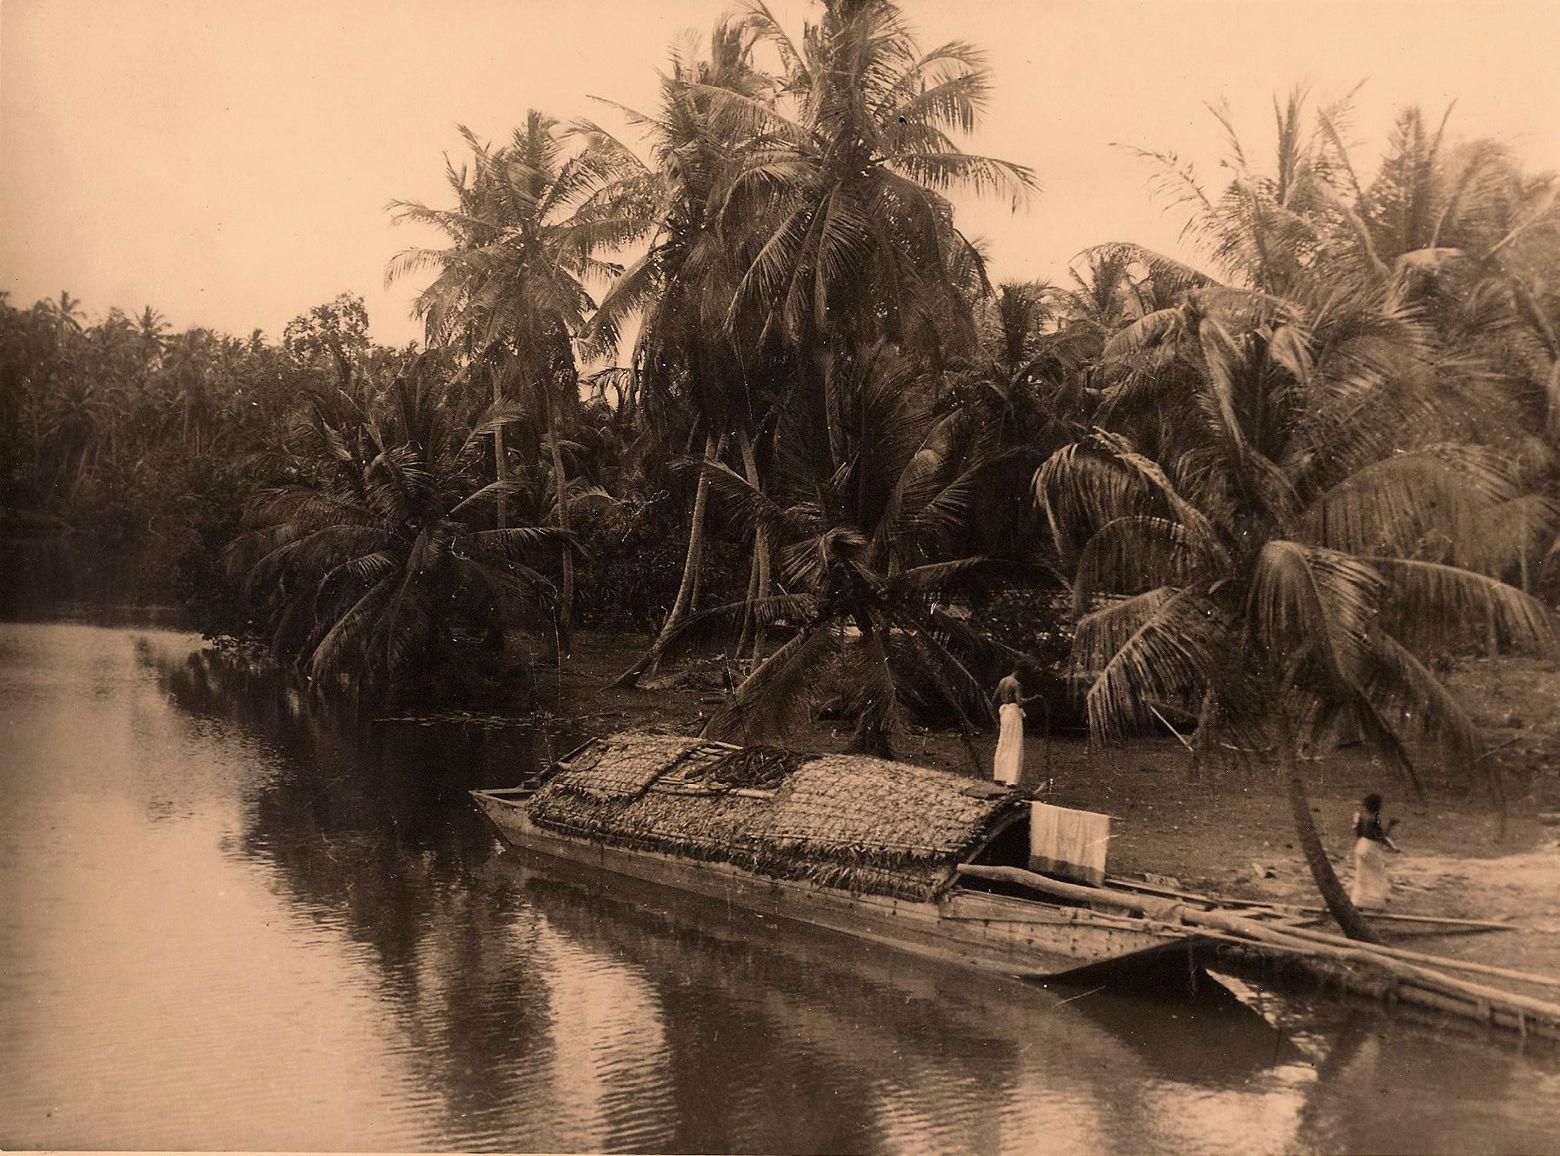 Цейлон. Лодка на северо-западном побережье